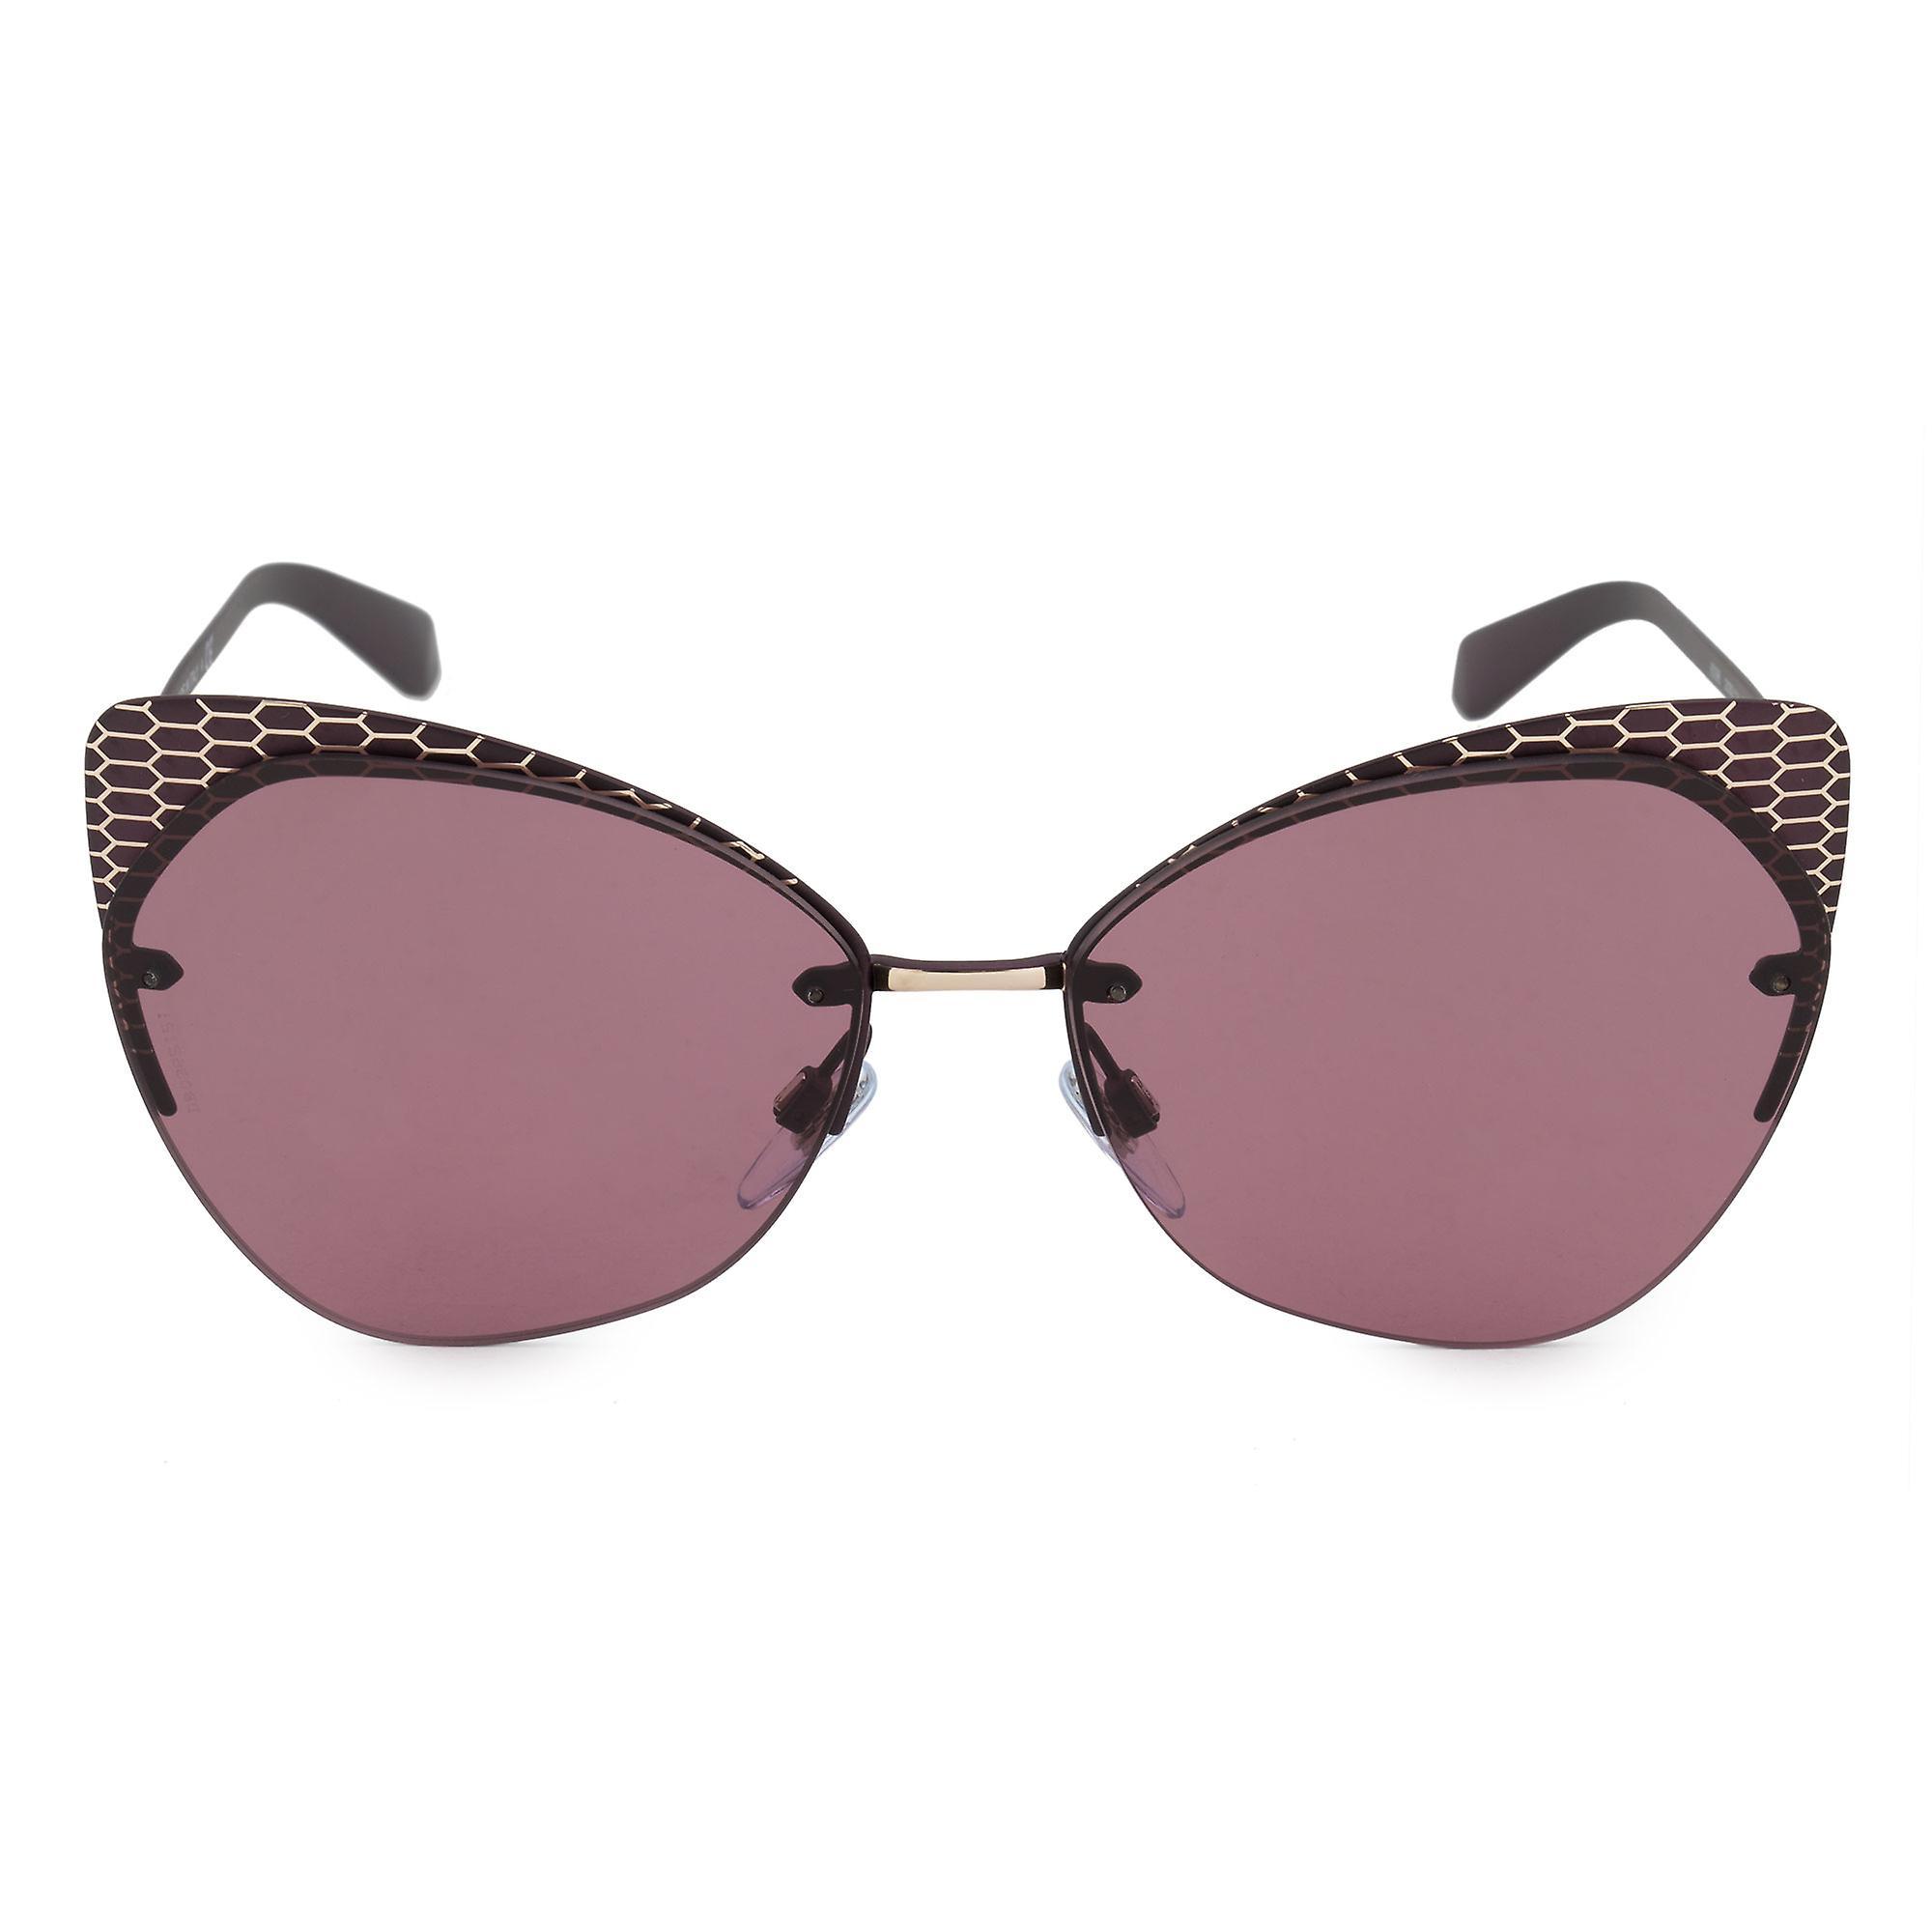 Bvlgari Cat Eye Sunglasses BV6096 20321A 58